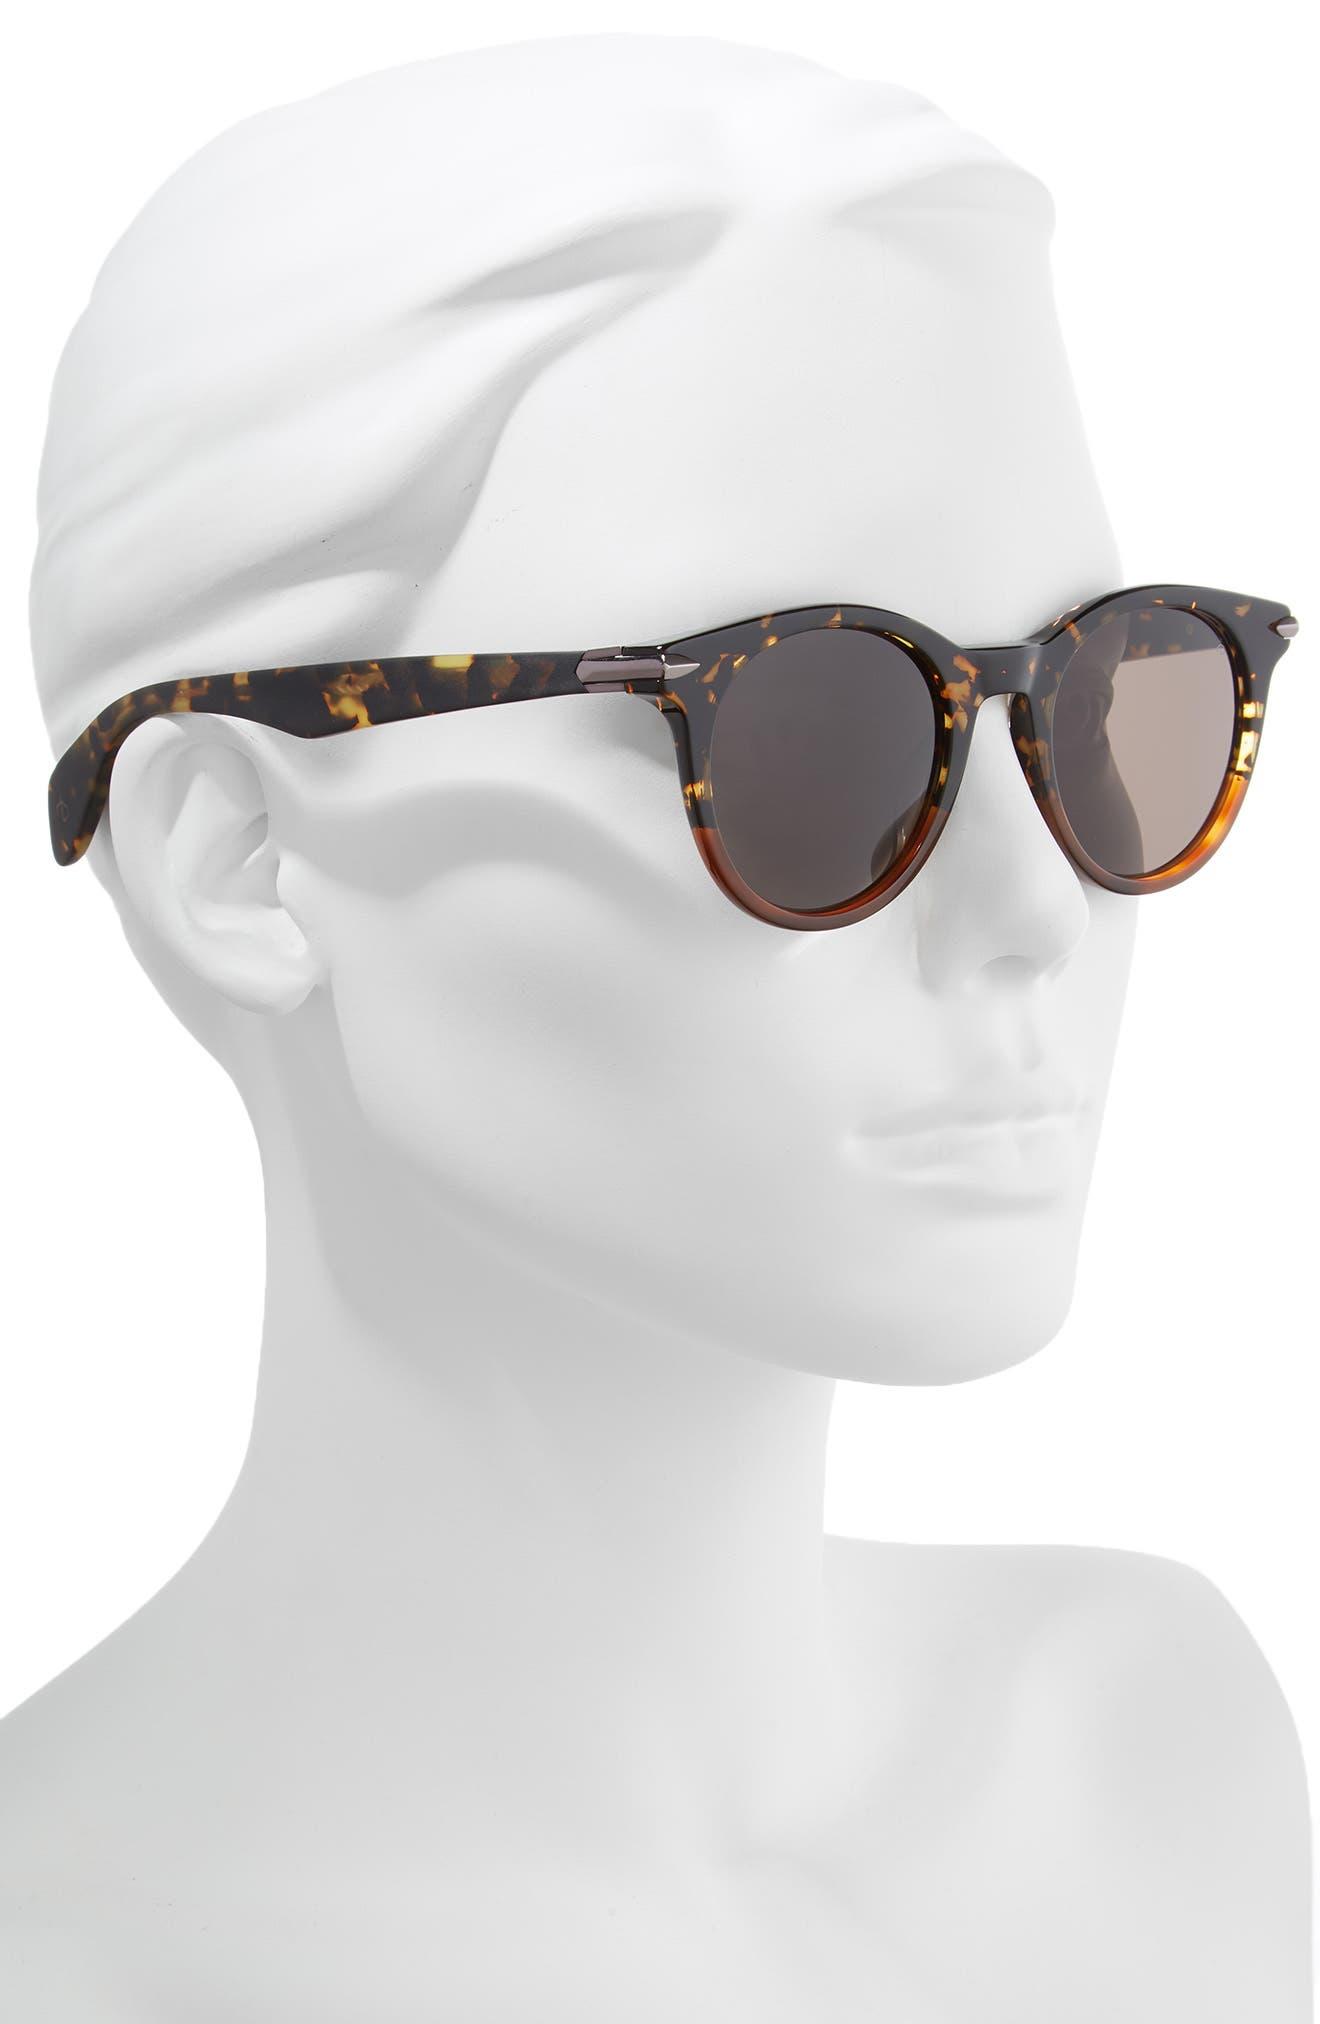 49mm Round Sunglasses,                             Alternate thumbnail 2, color,                             BLACK/ HAVANA HONEY